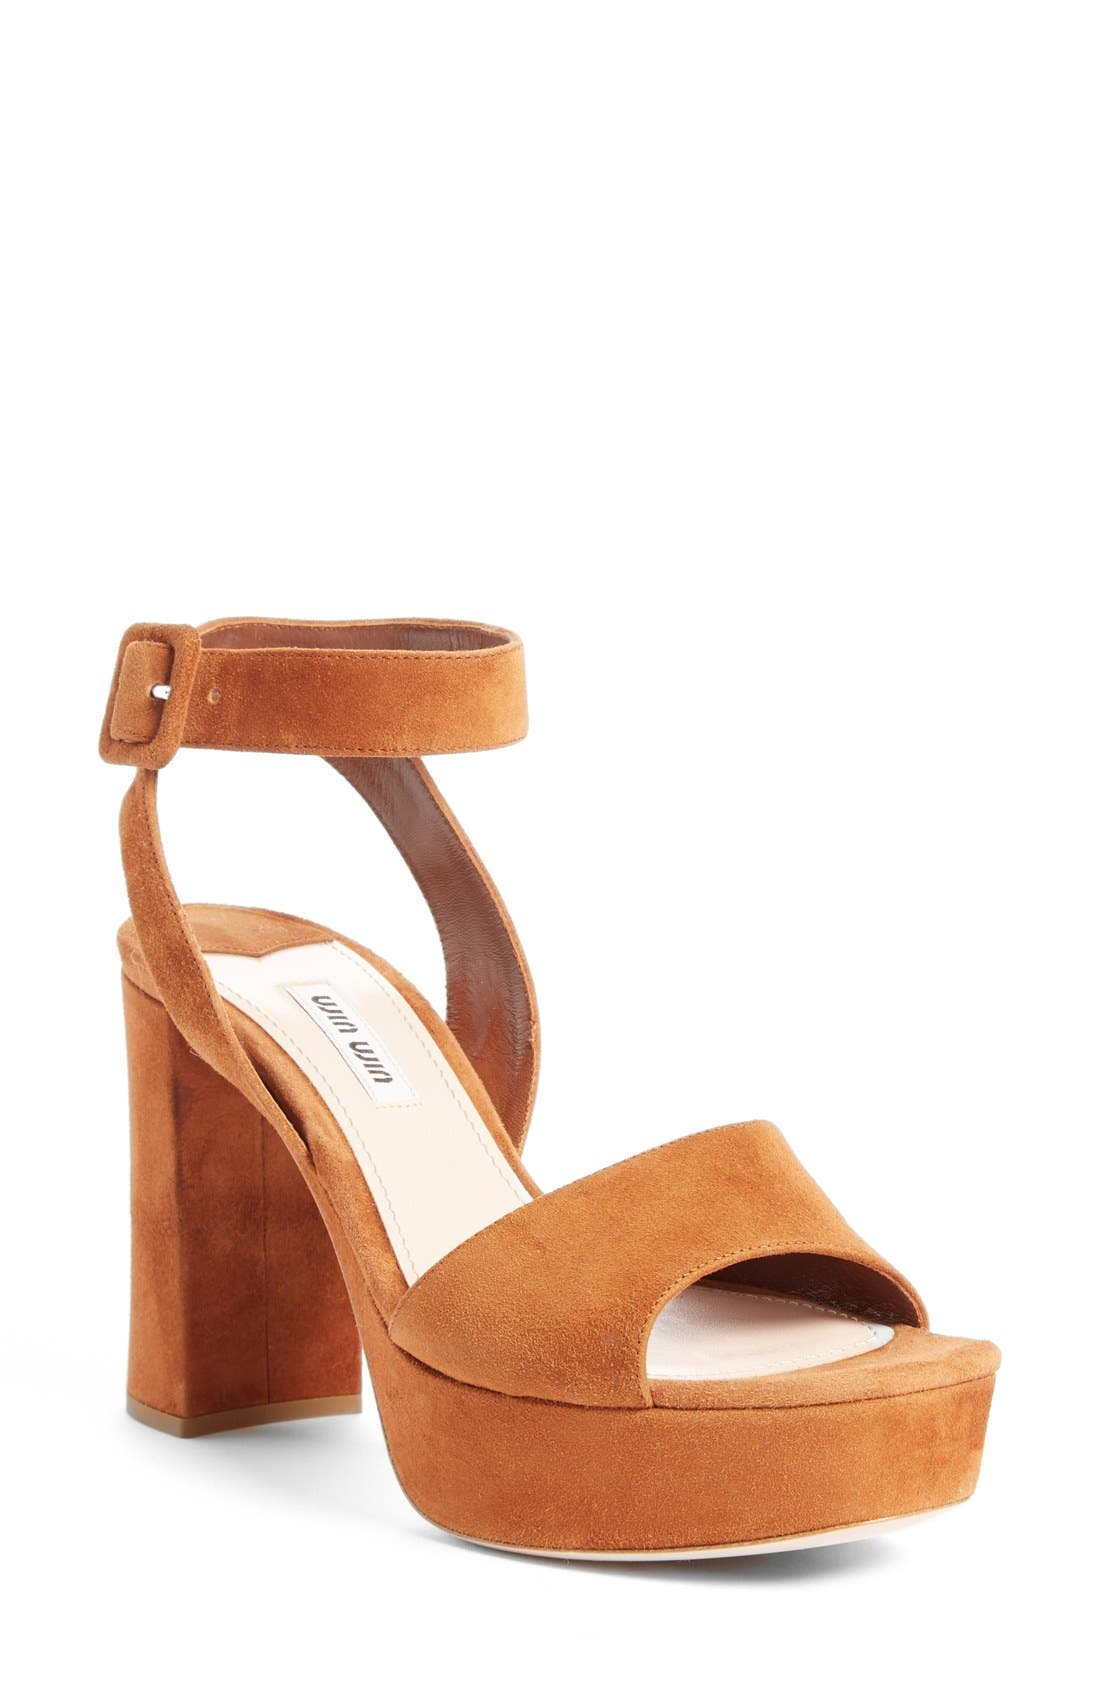 MIU MIU, 'Sandali' Ankle Strap Sandal, Main thumbnail 1, color, 200